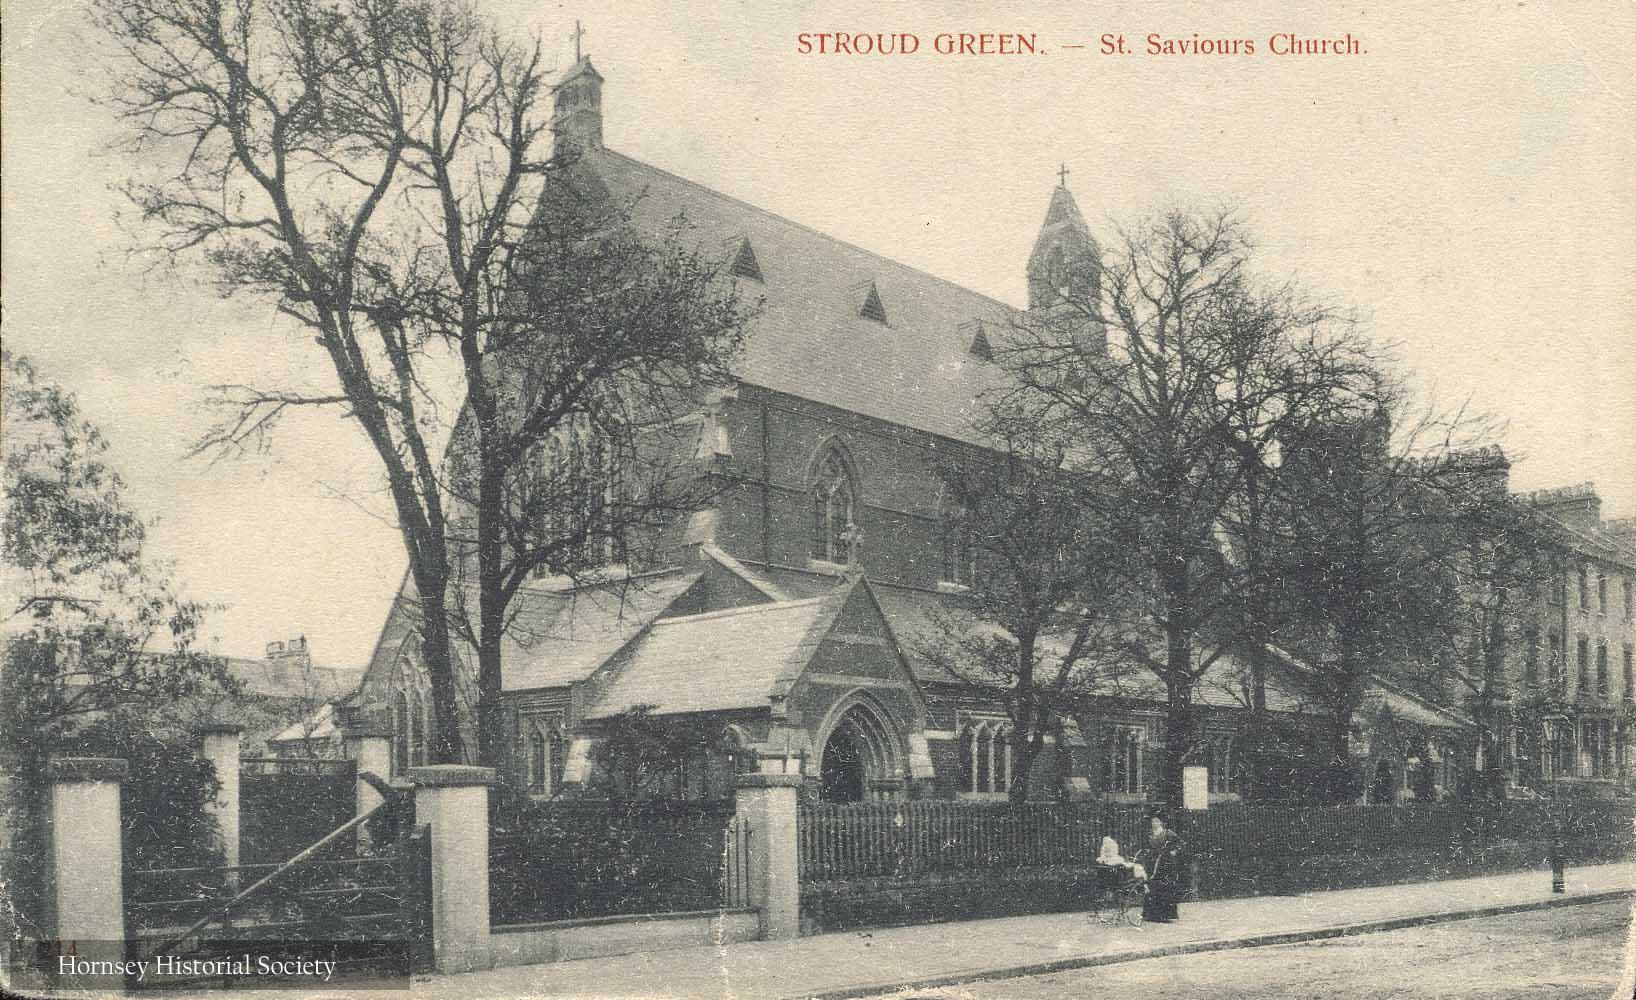 St Saviours Church, Stroud Green